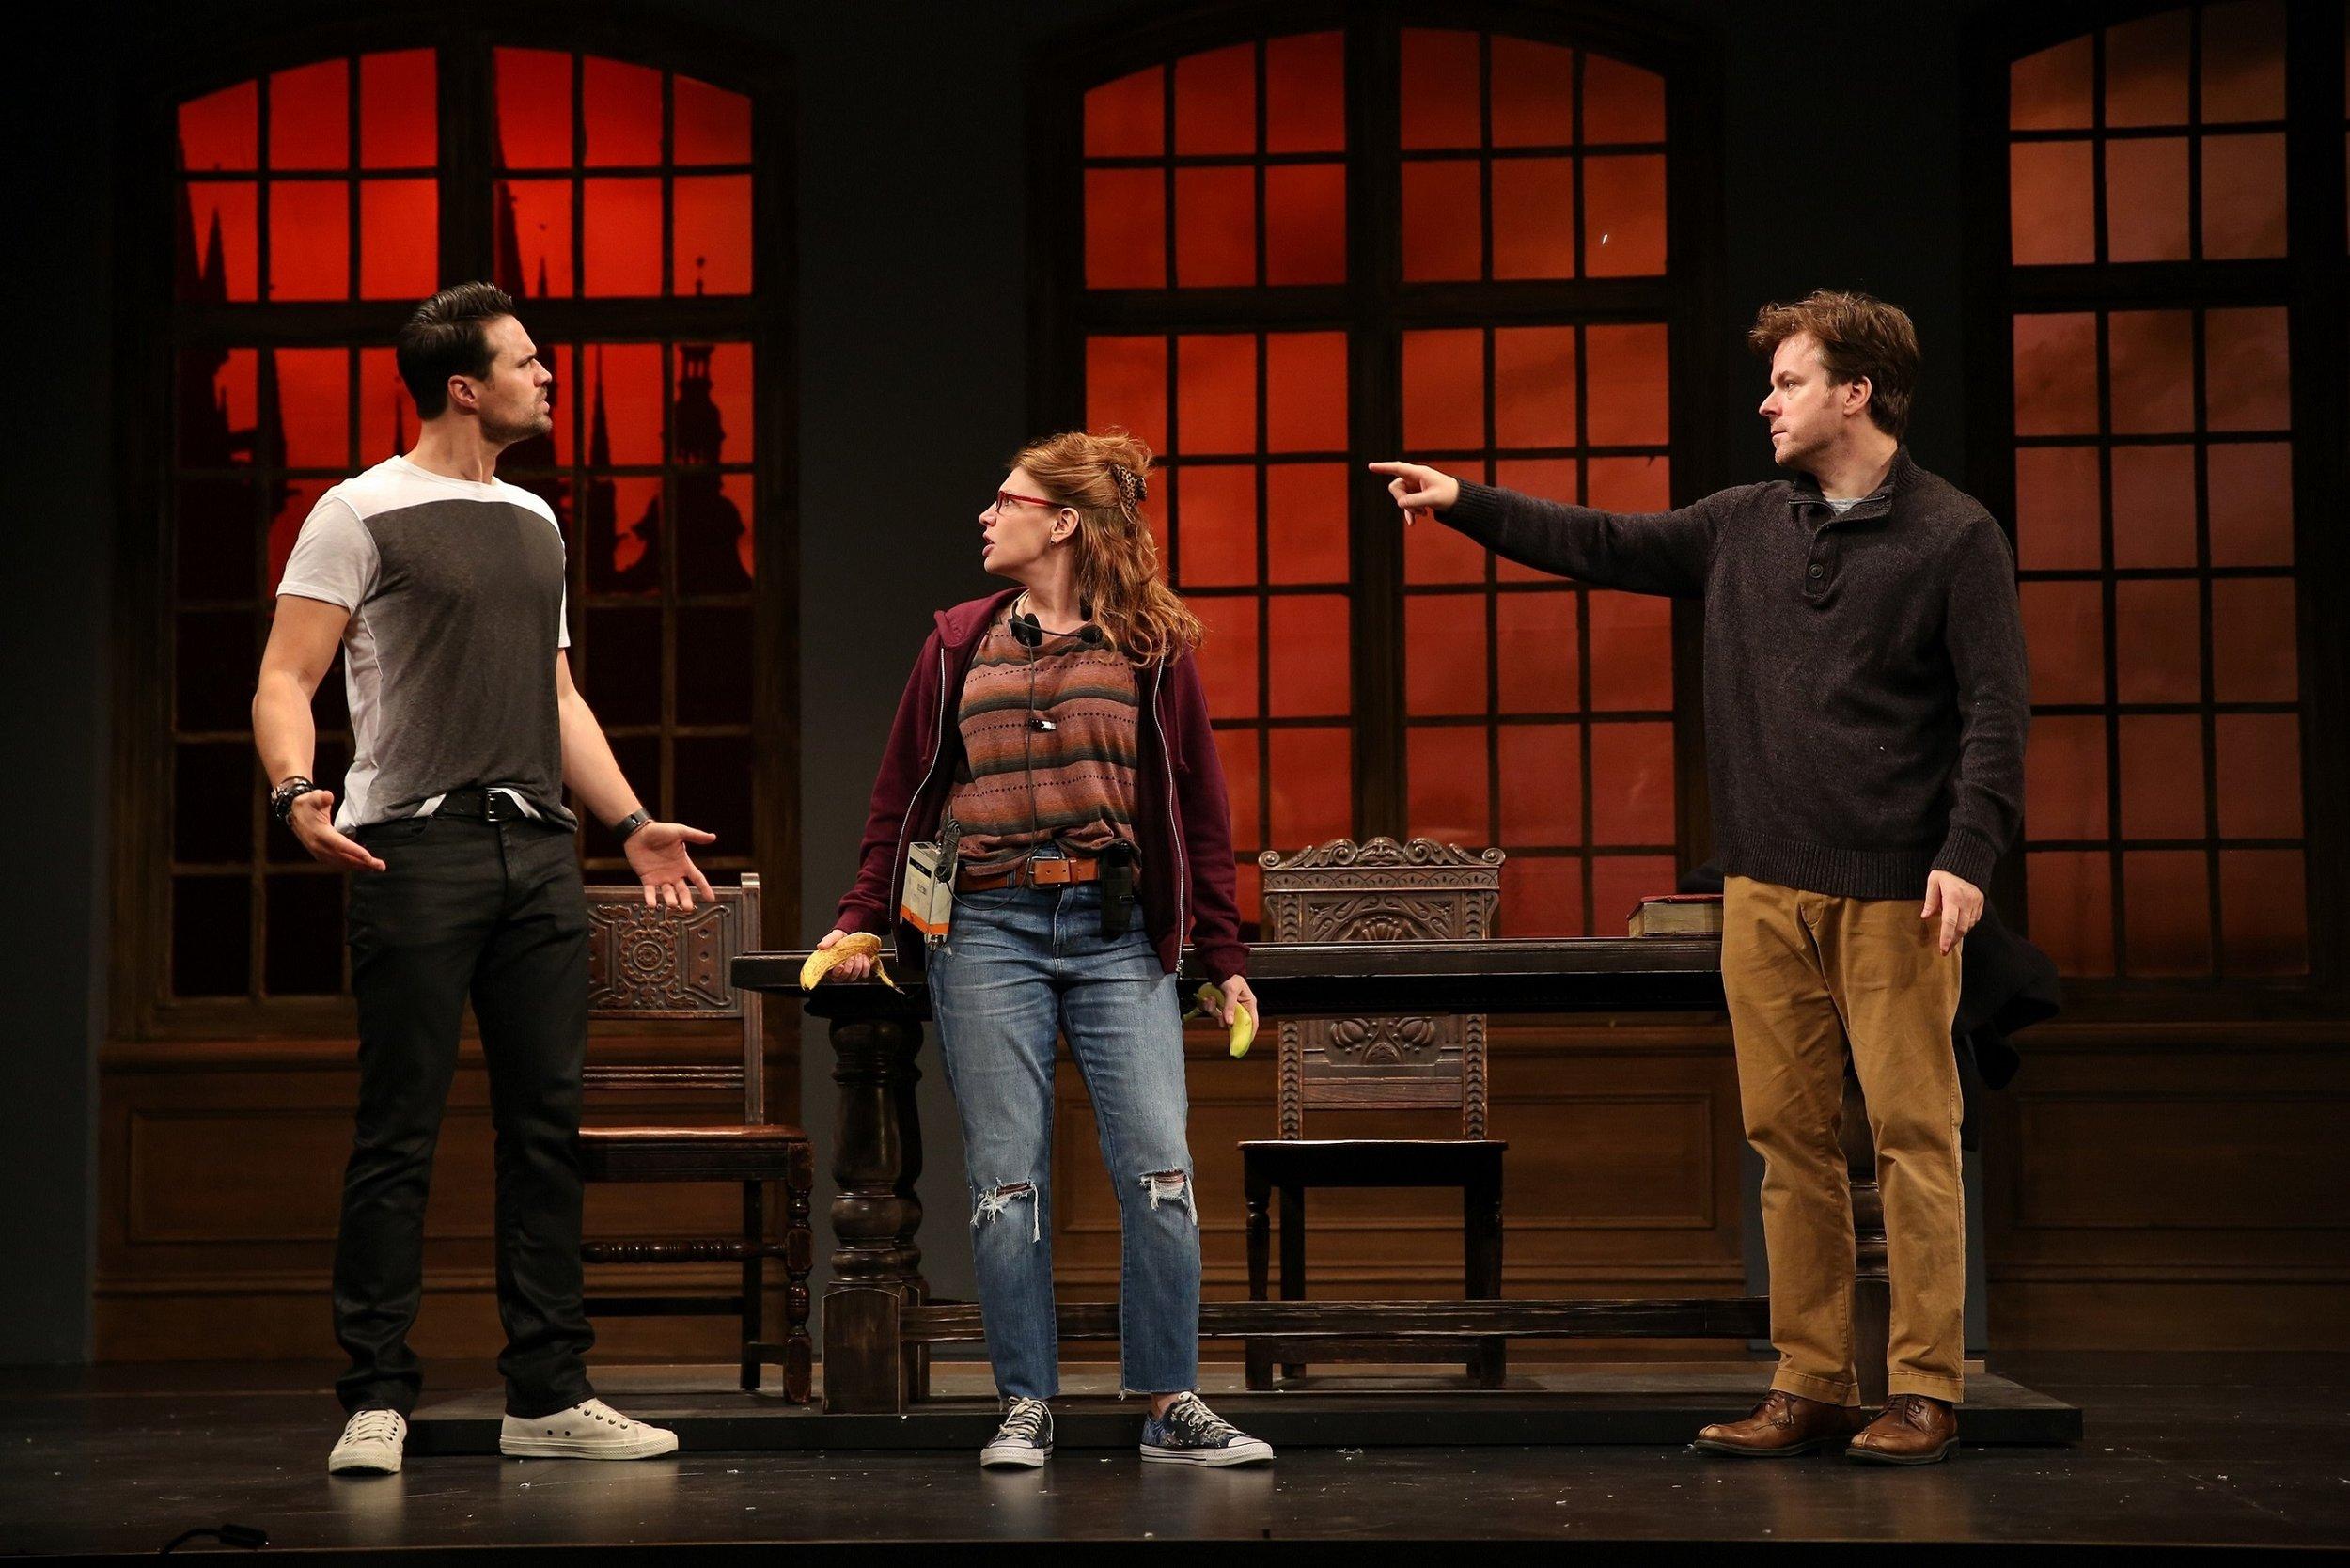 Jake (Brett Dalton), Roxanne (Andrea Syglowski), Harry (Eric Bryant)